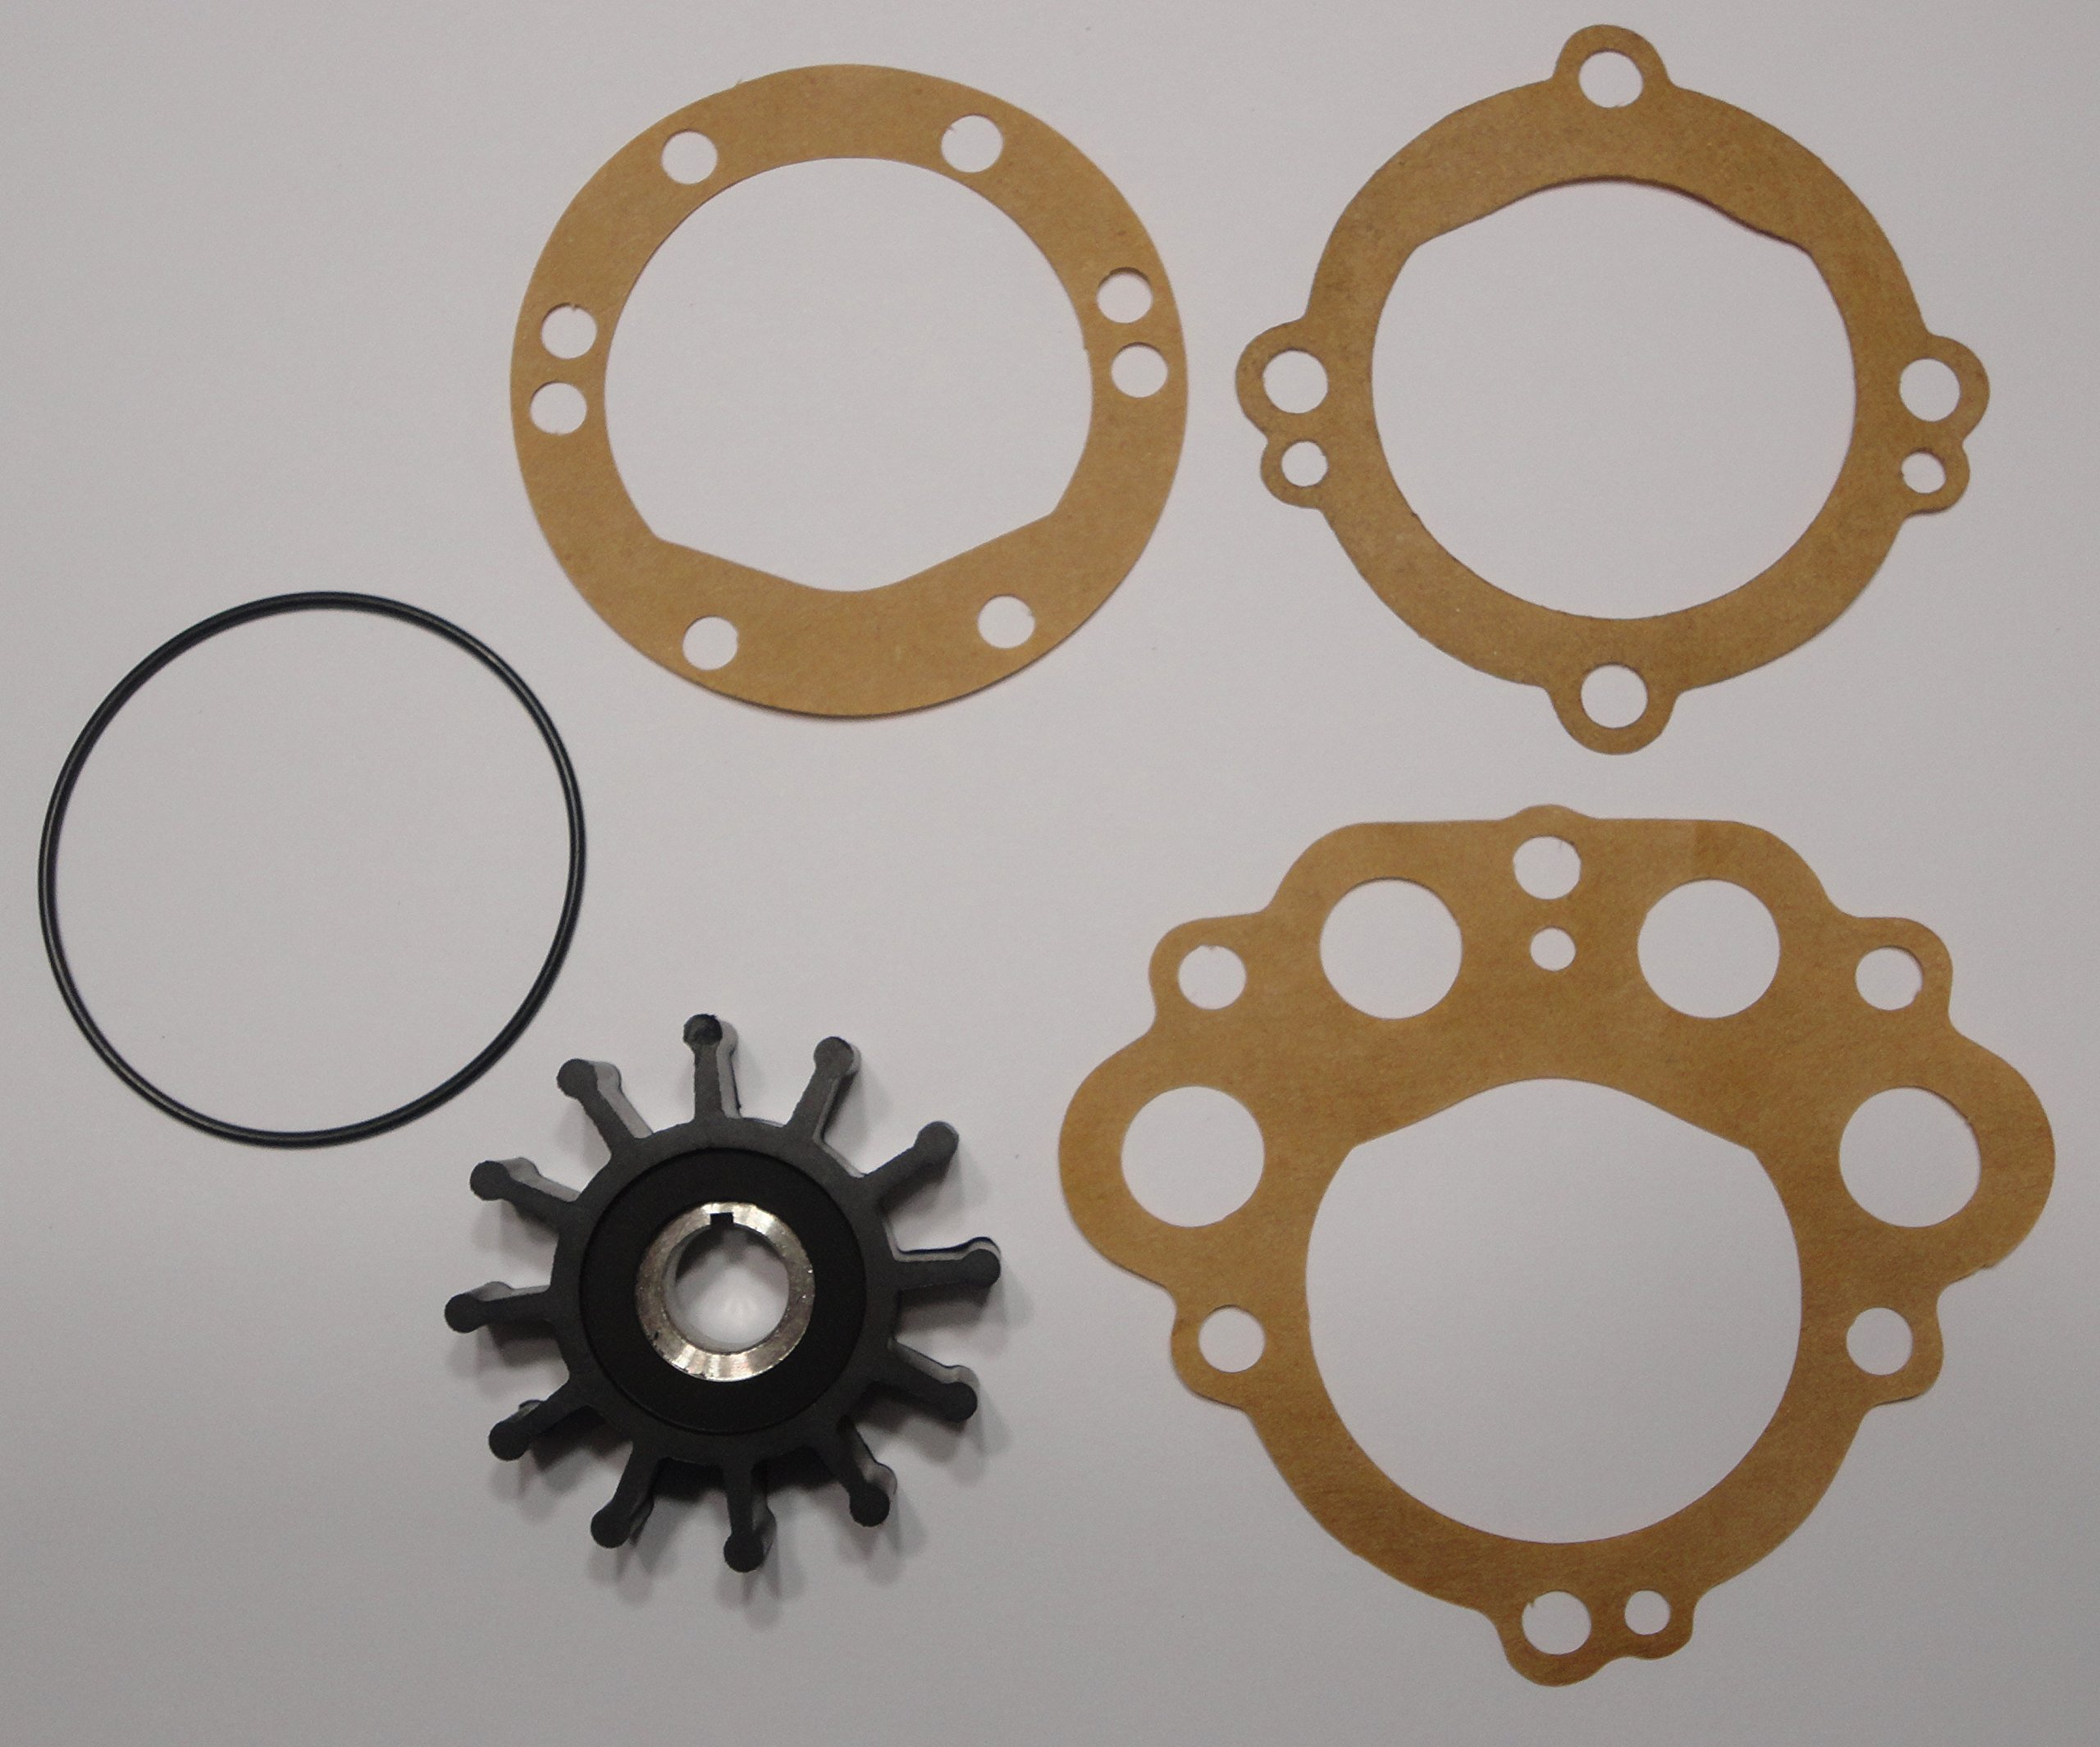 StayCoolPumps Impeller Kit Replaces Sherwood 10077K